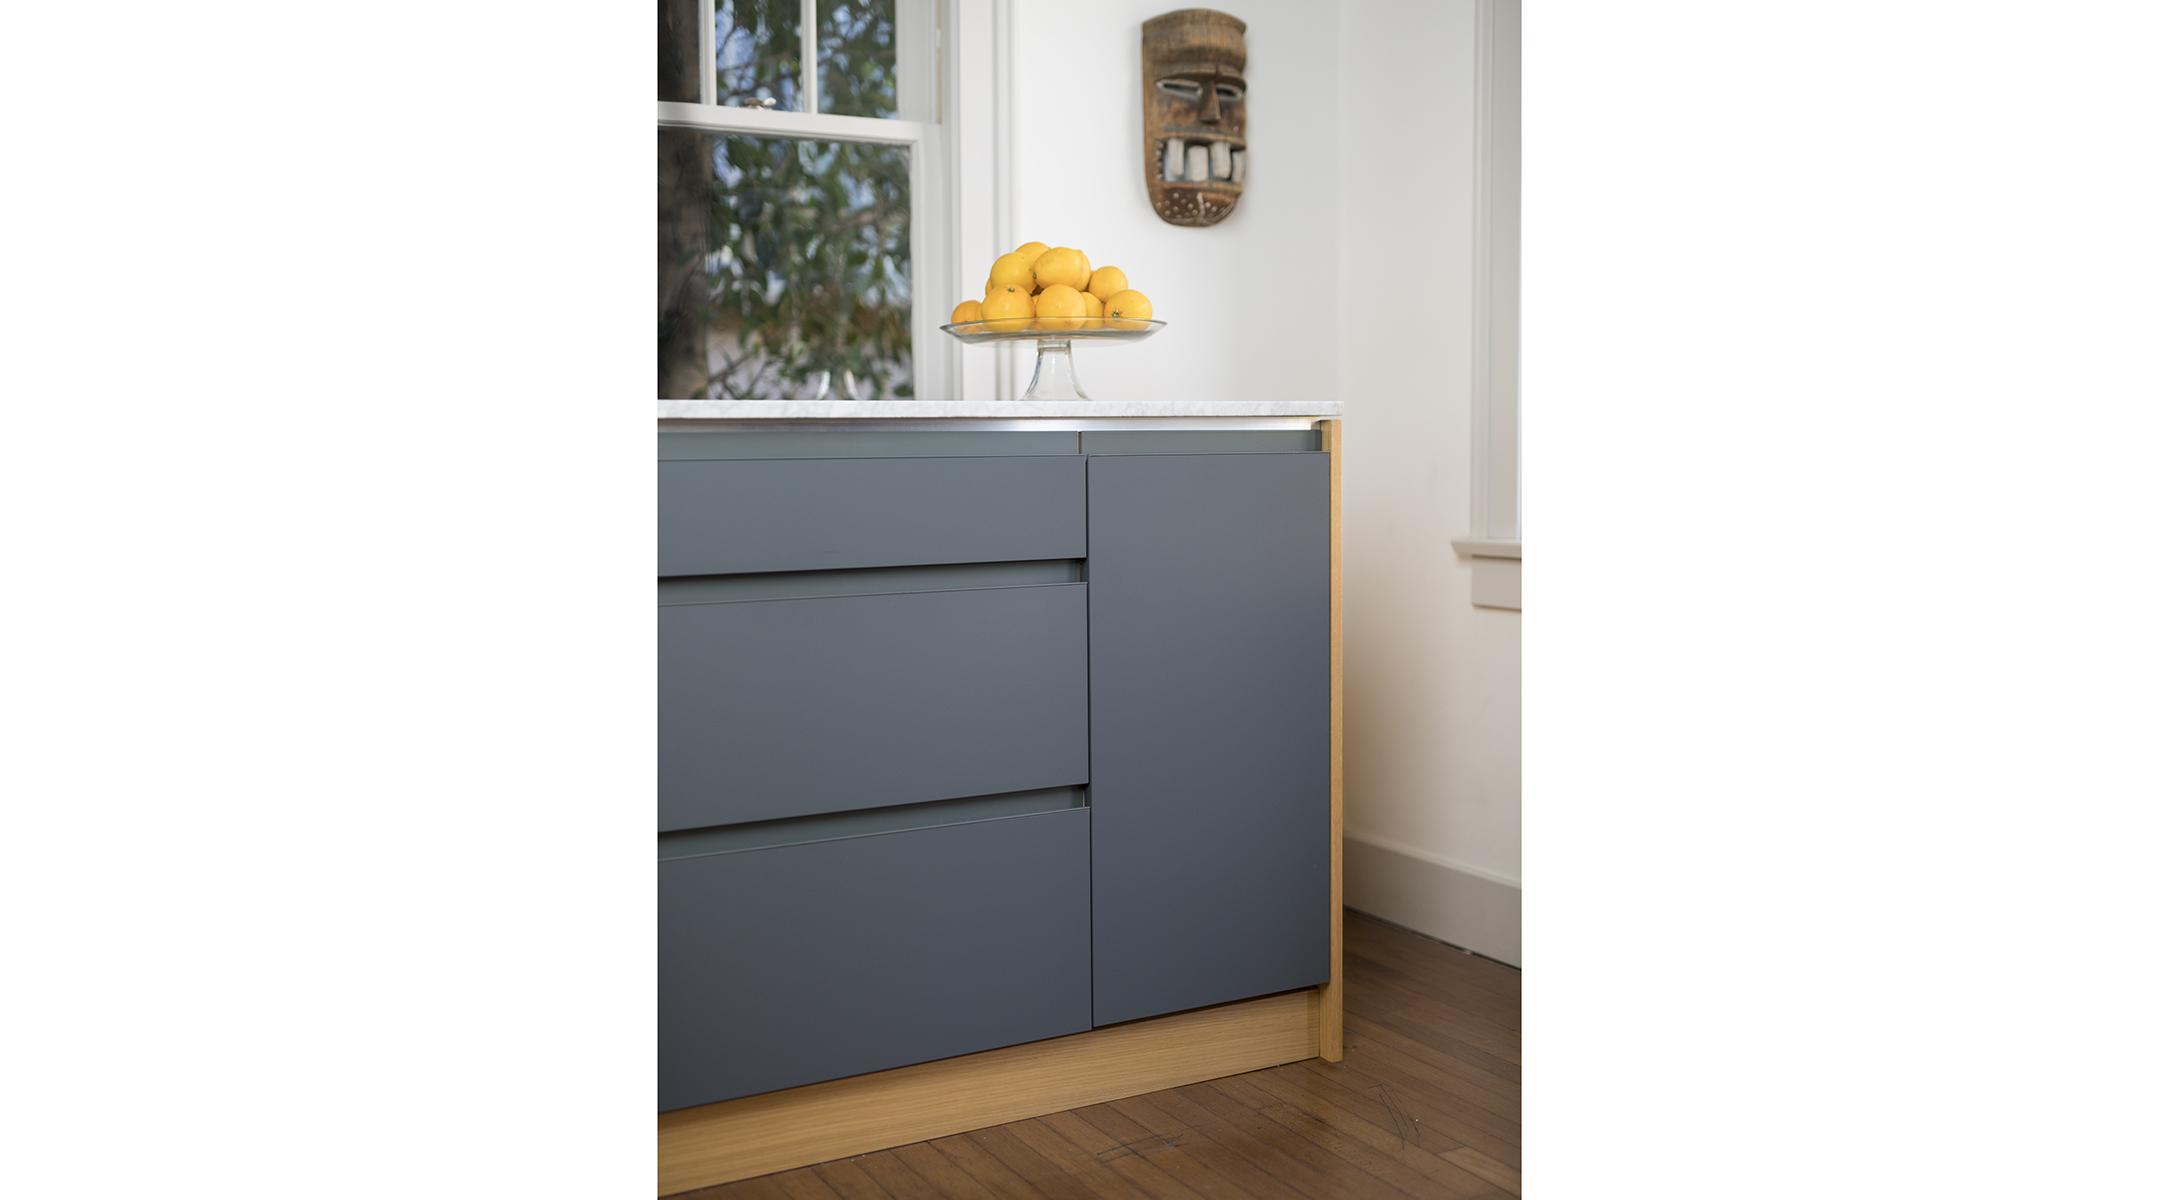 Custom Ikea Fenix Dunsmuir Cabinets Integrated Pull